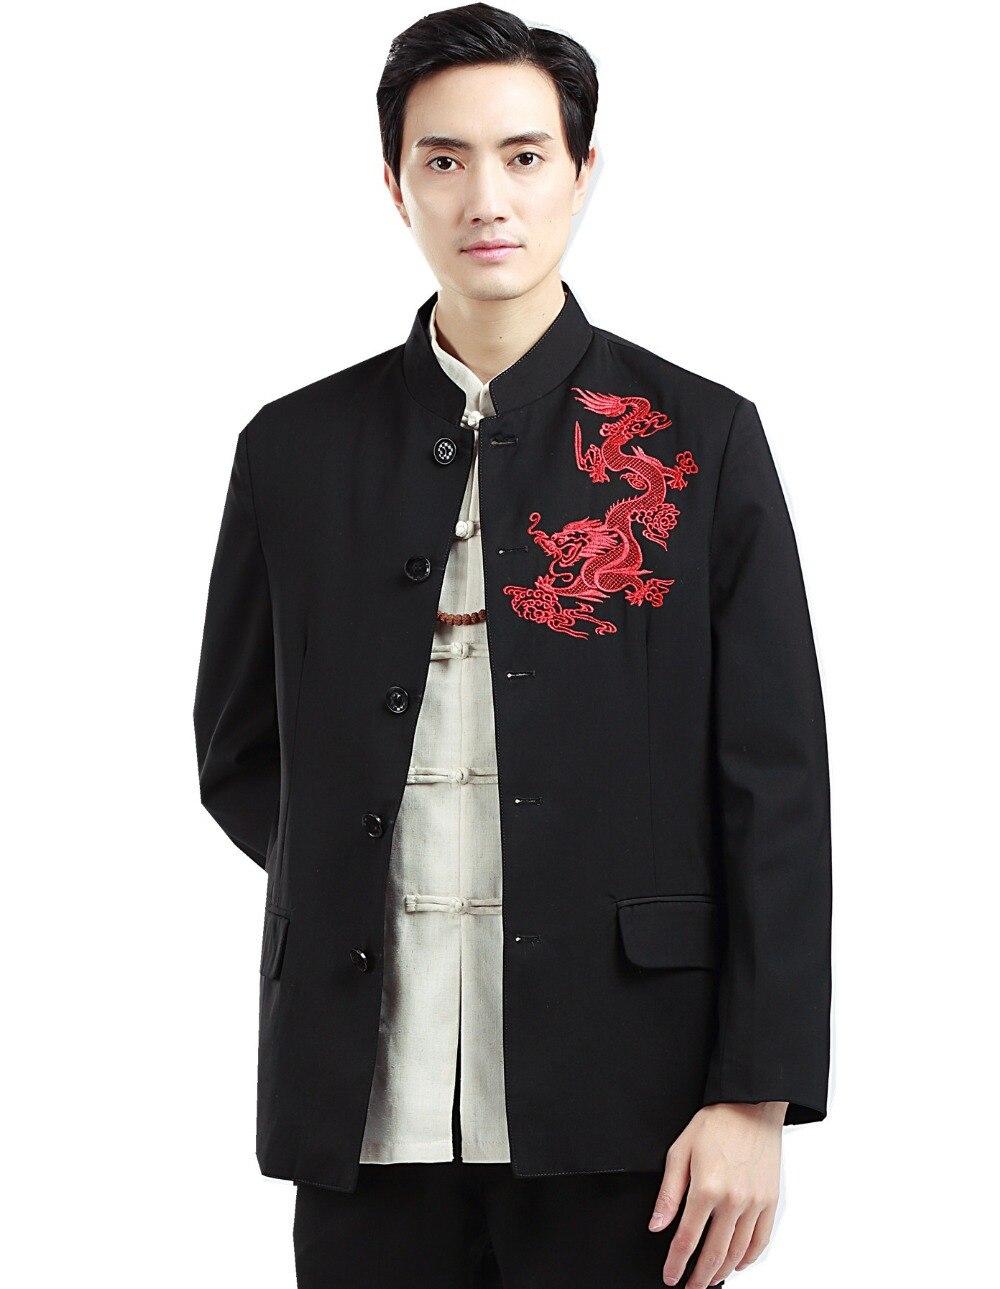 Shanghai Story à manches longues vêtements traditionnels chinois bouton chinois hommes Dragon broderie mandarin col veste pour hommes